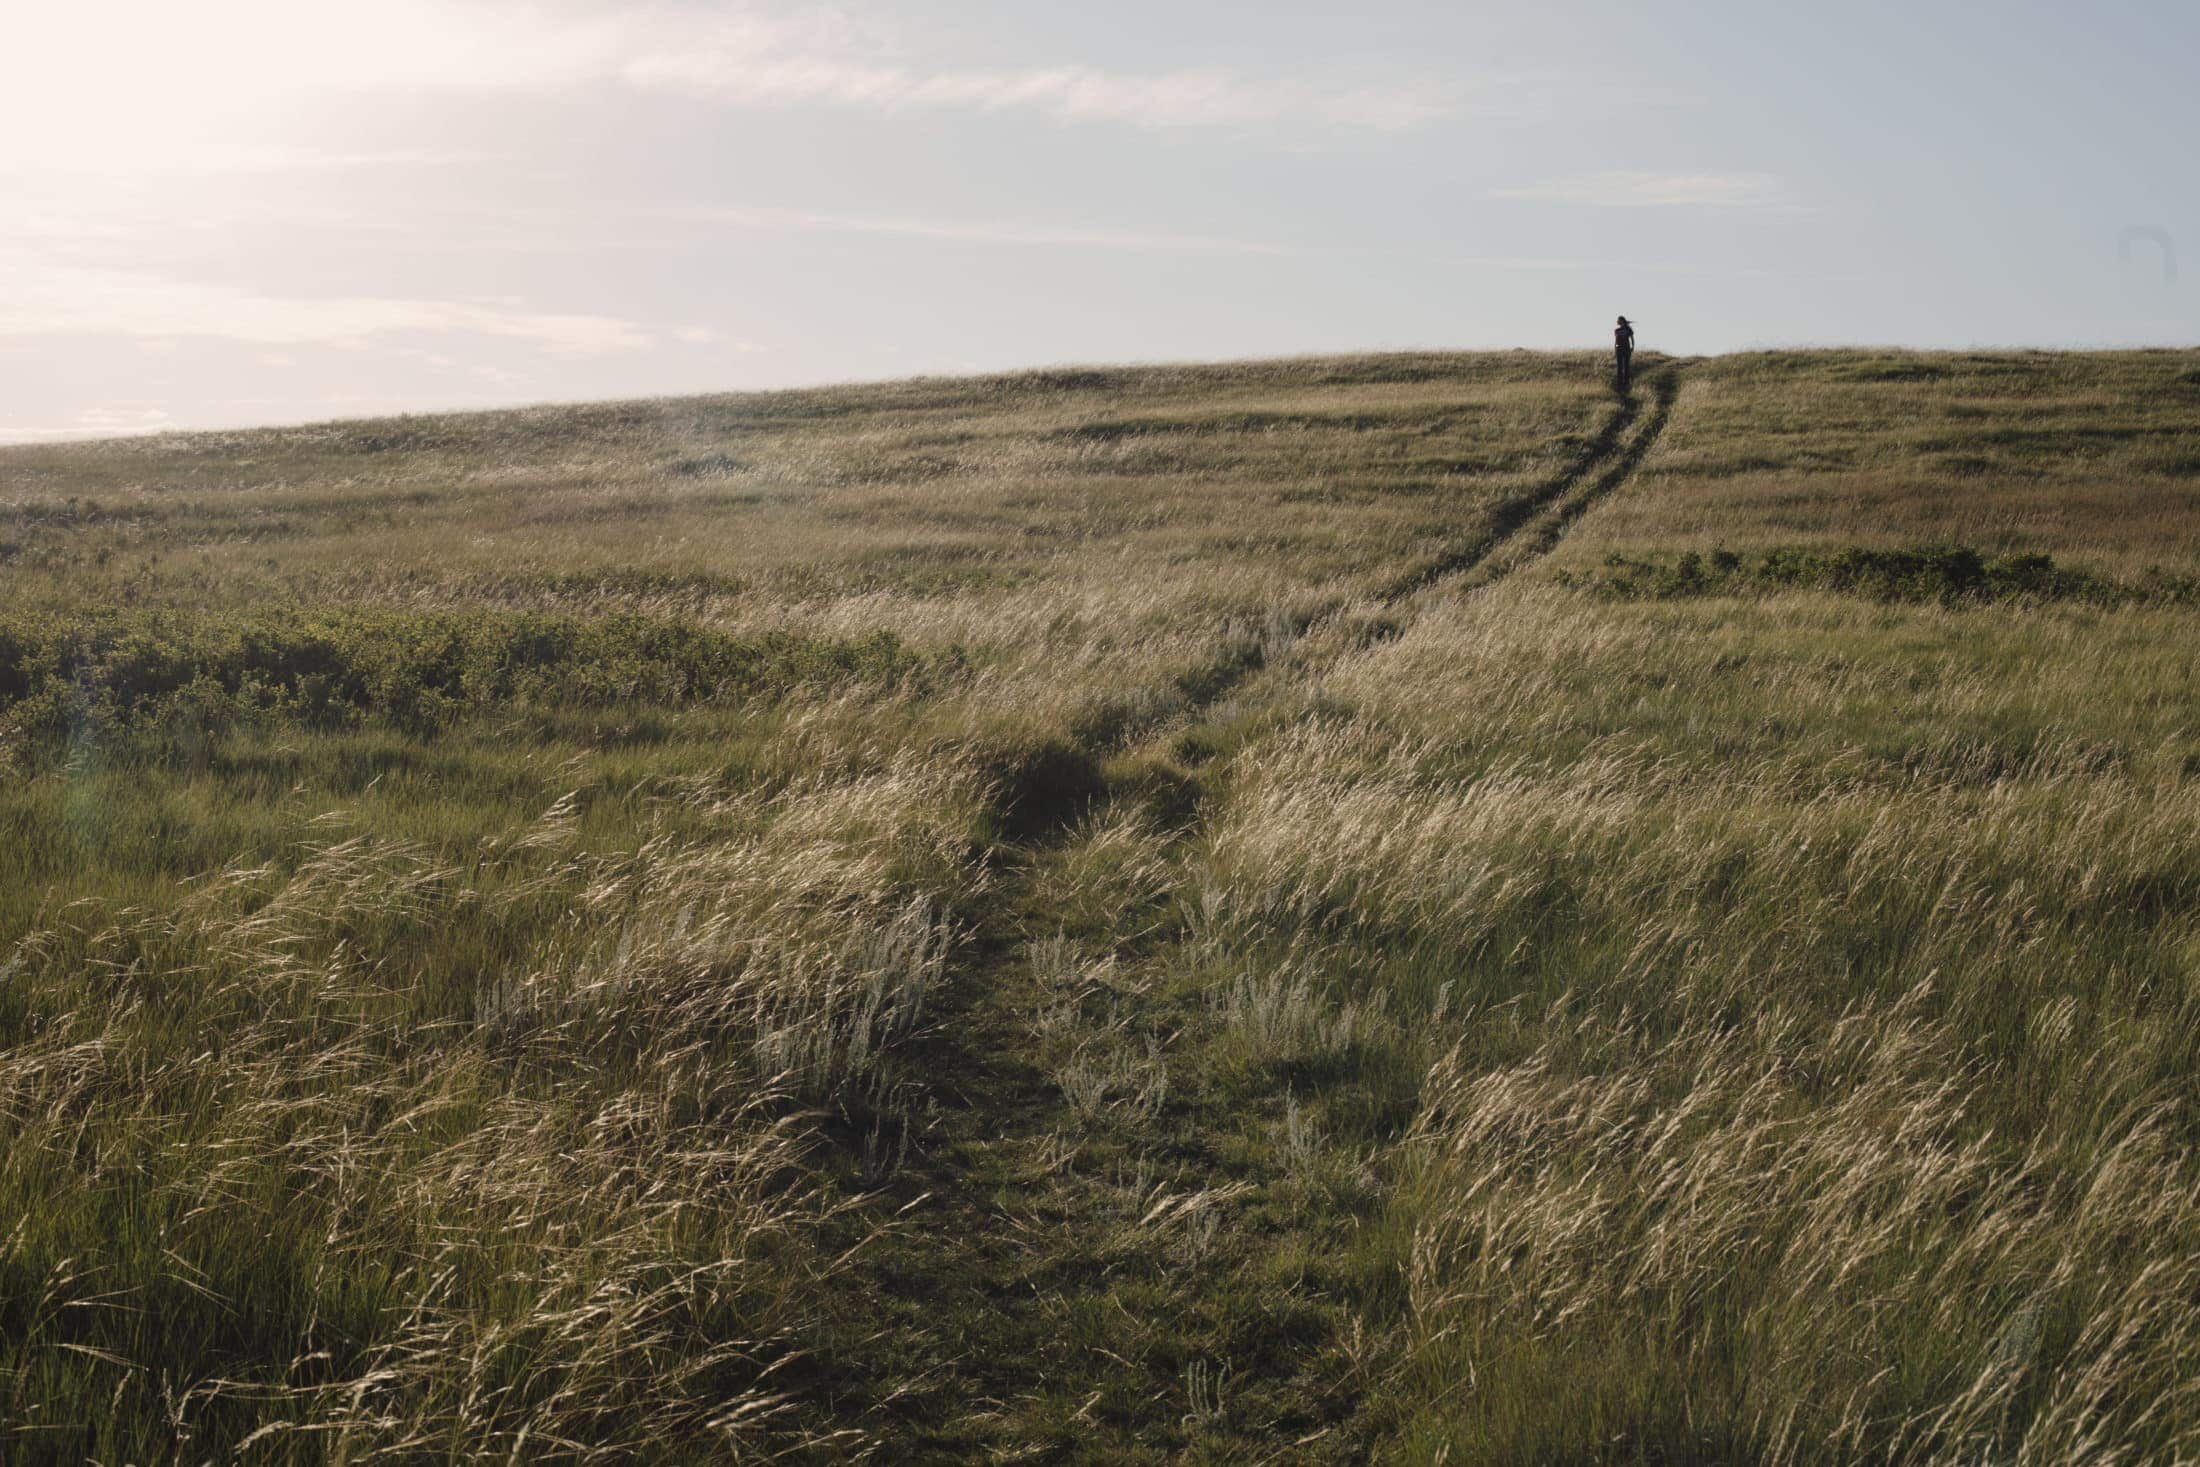 Federal election 2021: a view of native prairie grasslands